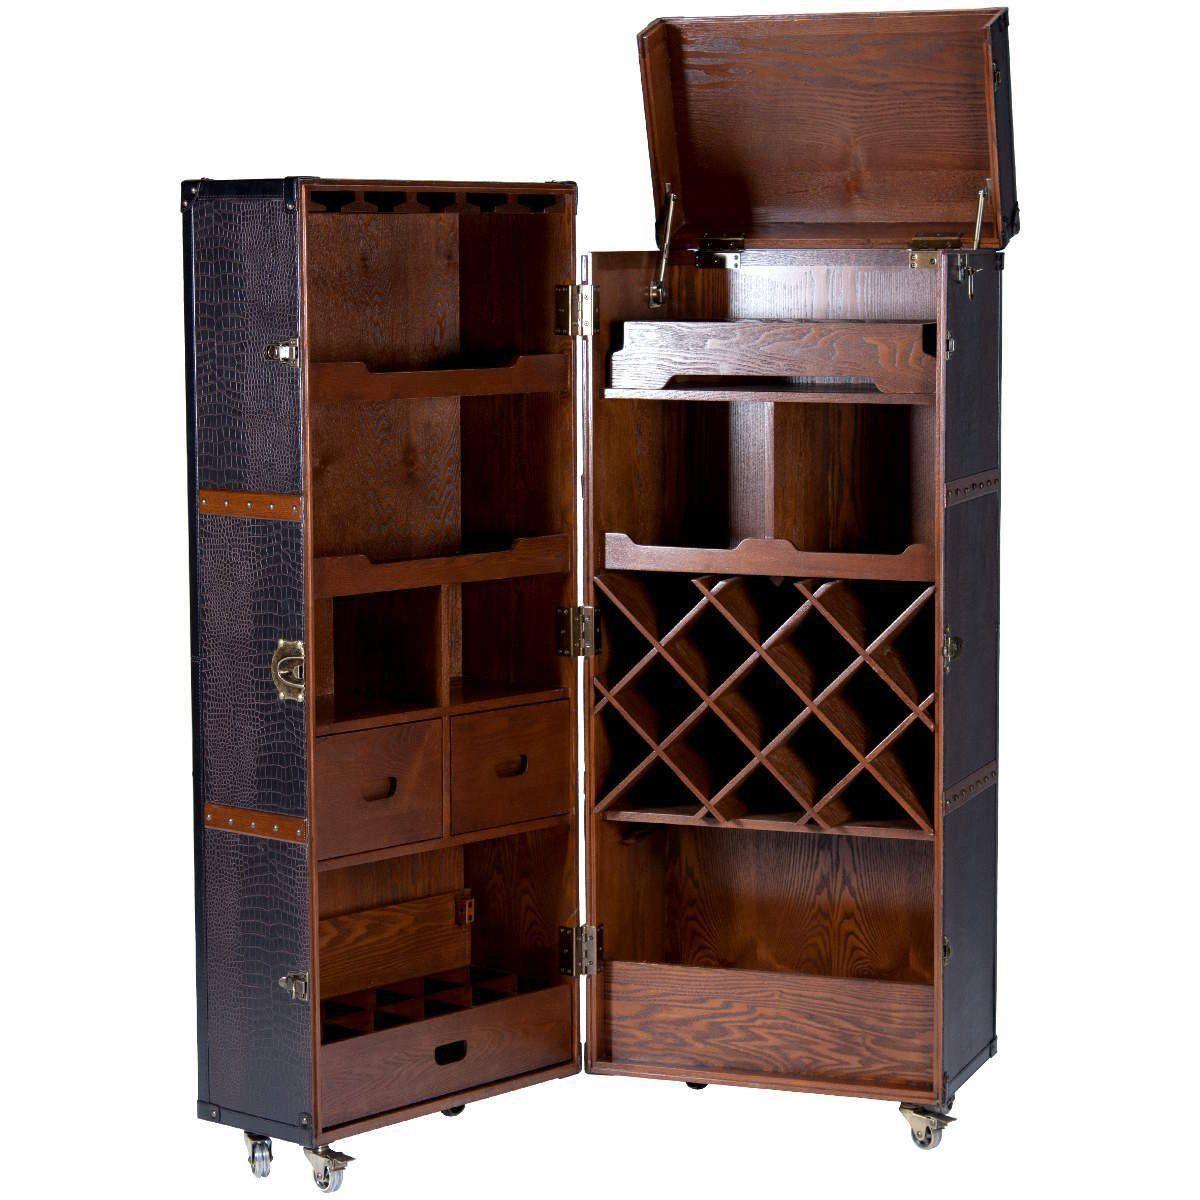 Butlers Hemingway Koffer Bar Mit Separatem Tablett Amazon De